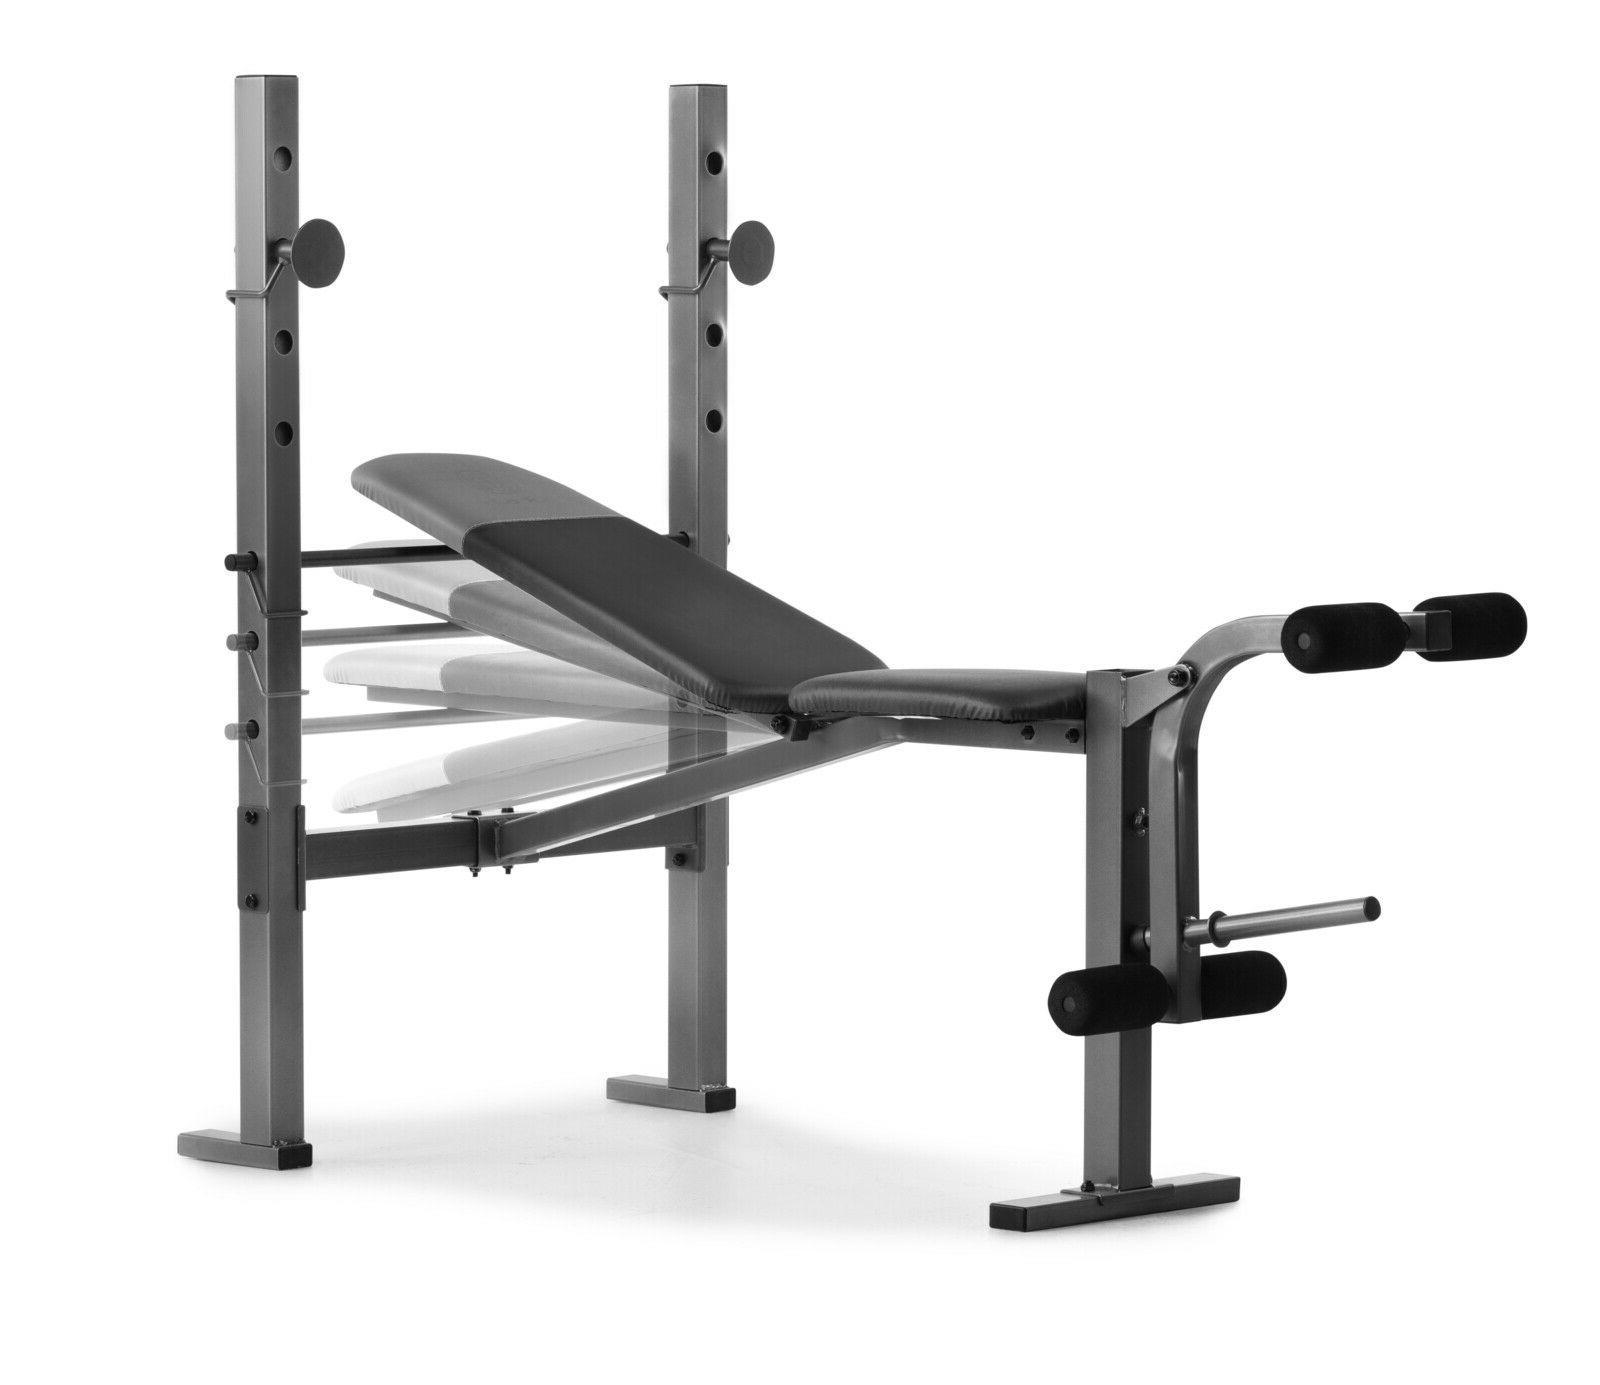 Weider 6.1 Multi-Position Weight Developer and